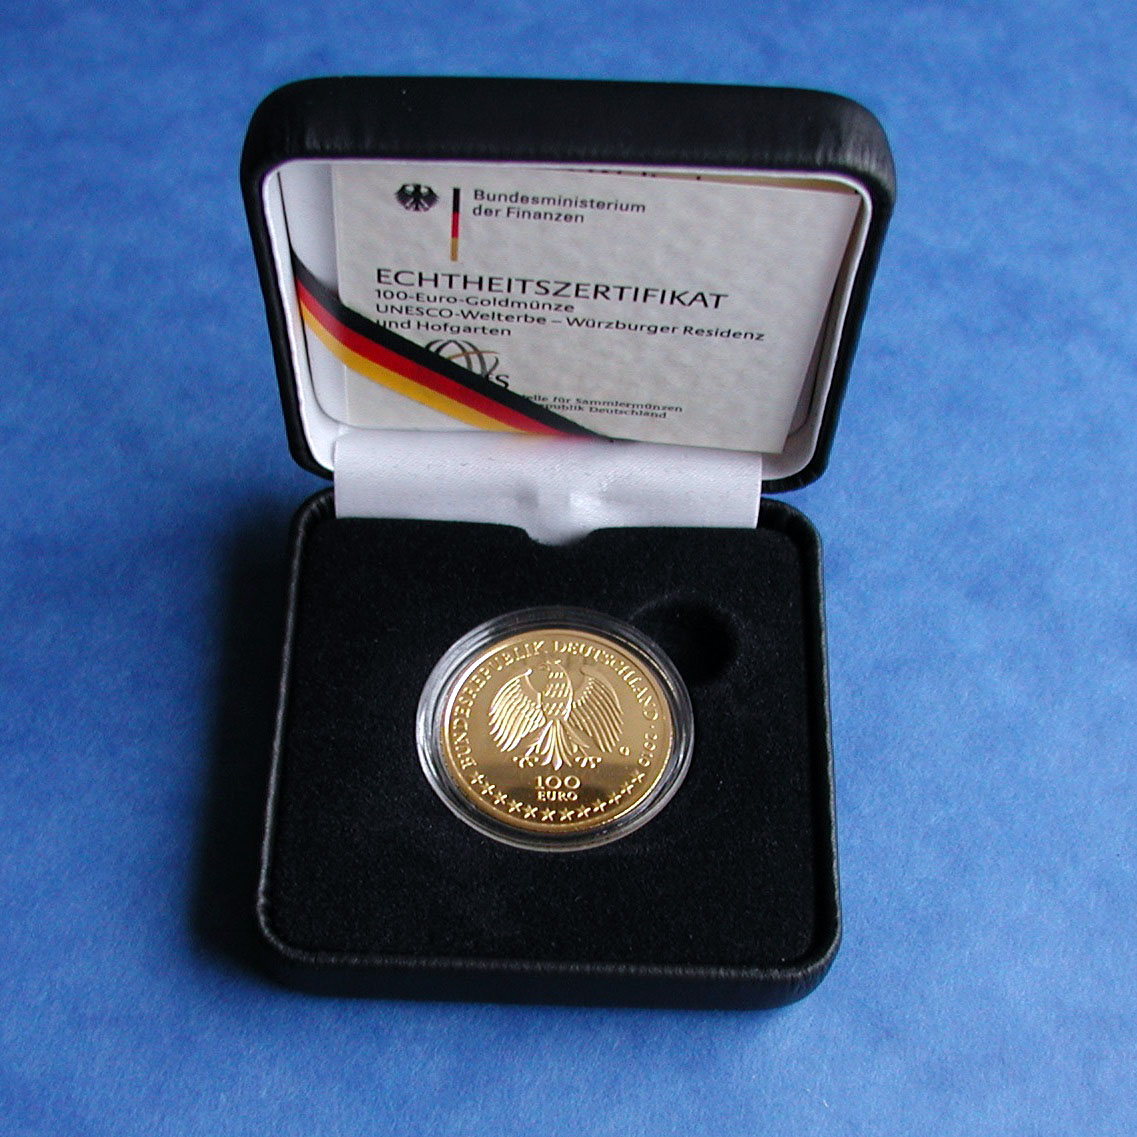 100 Euro Goldmünze Diverse Jahrgänge 12 05 Oz 1555 G Brd